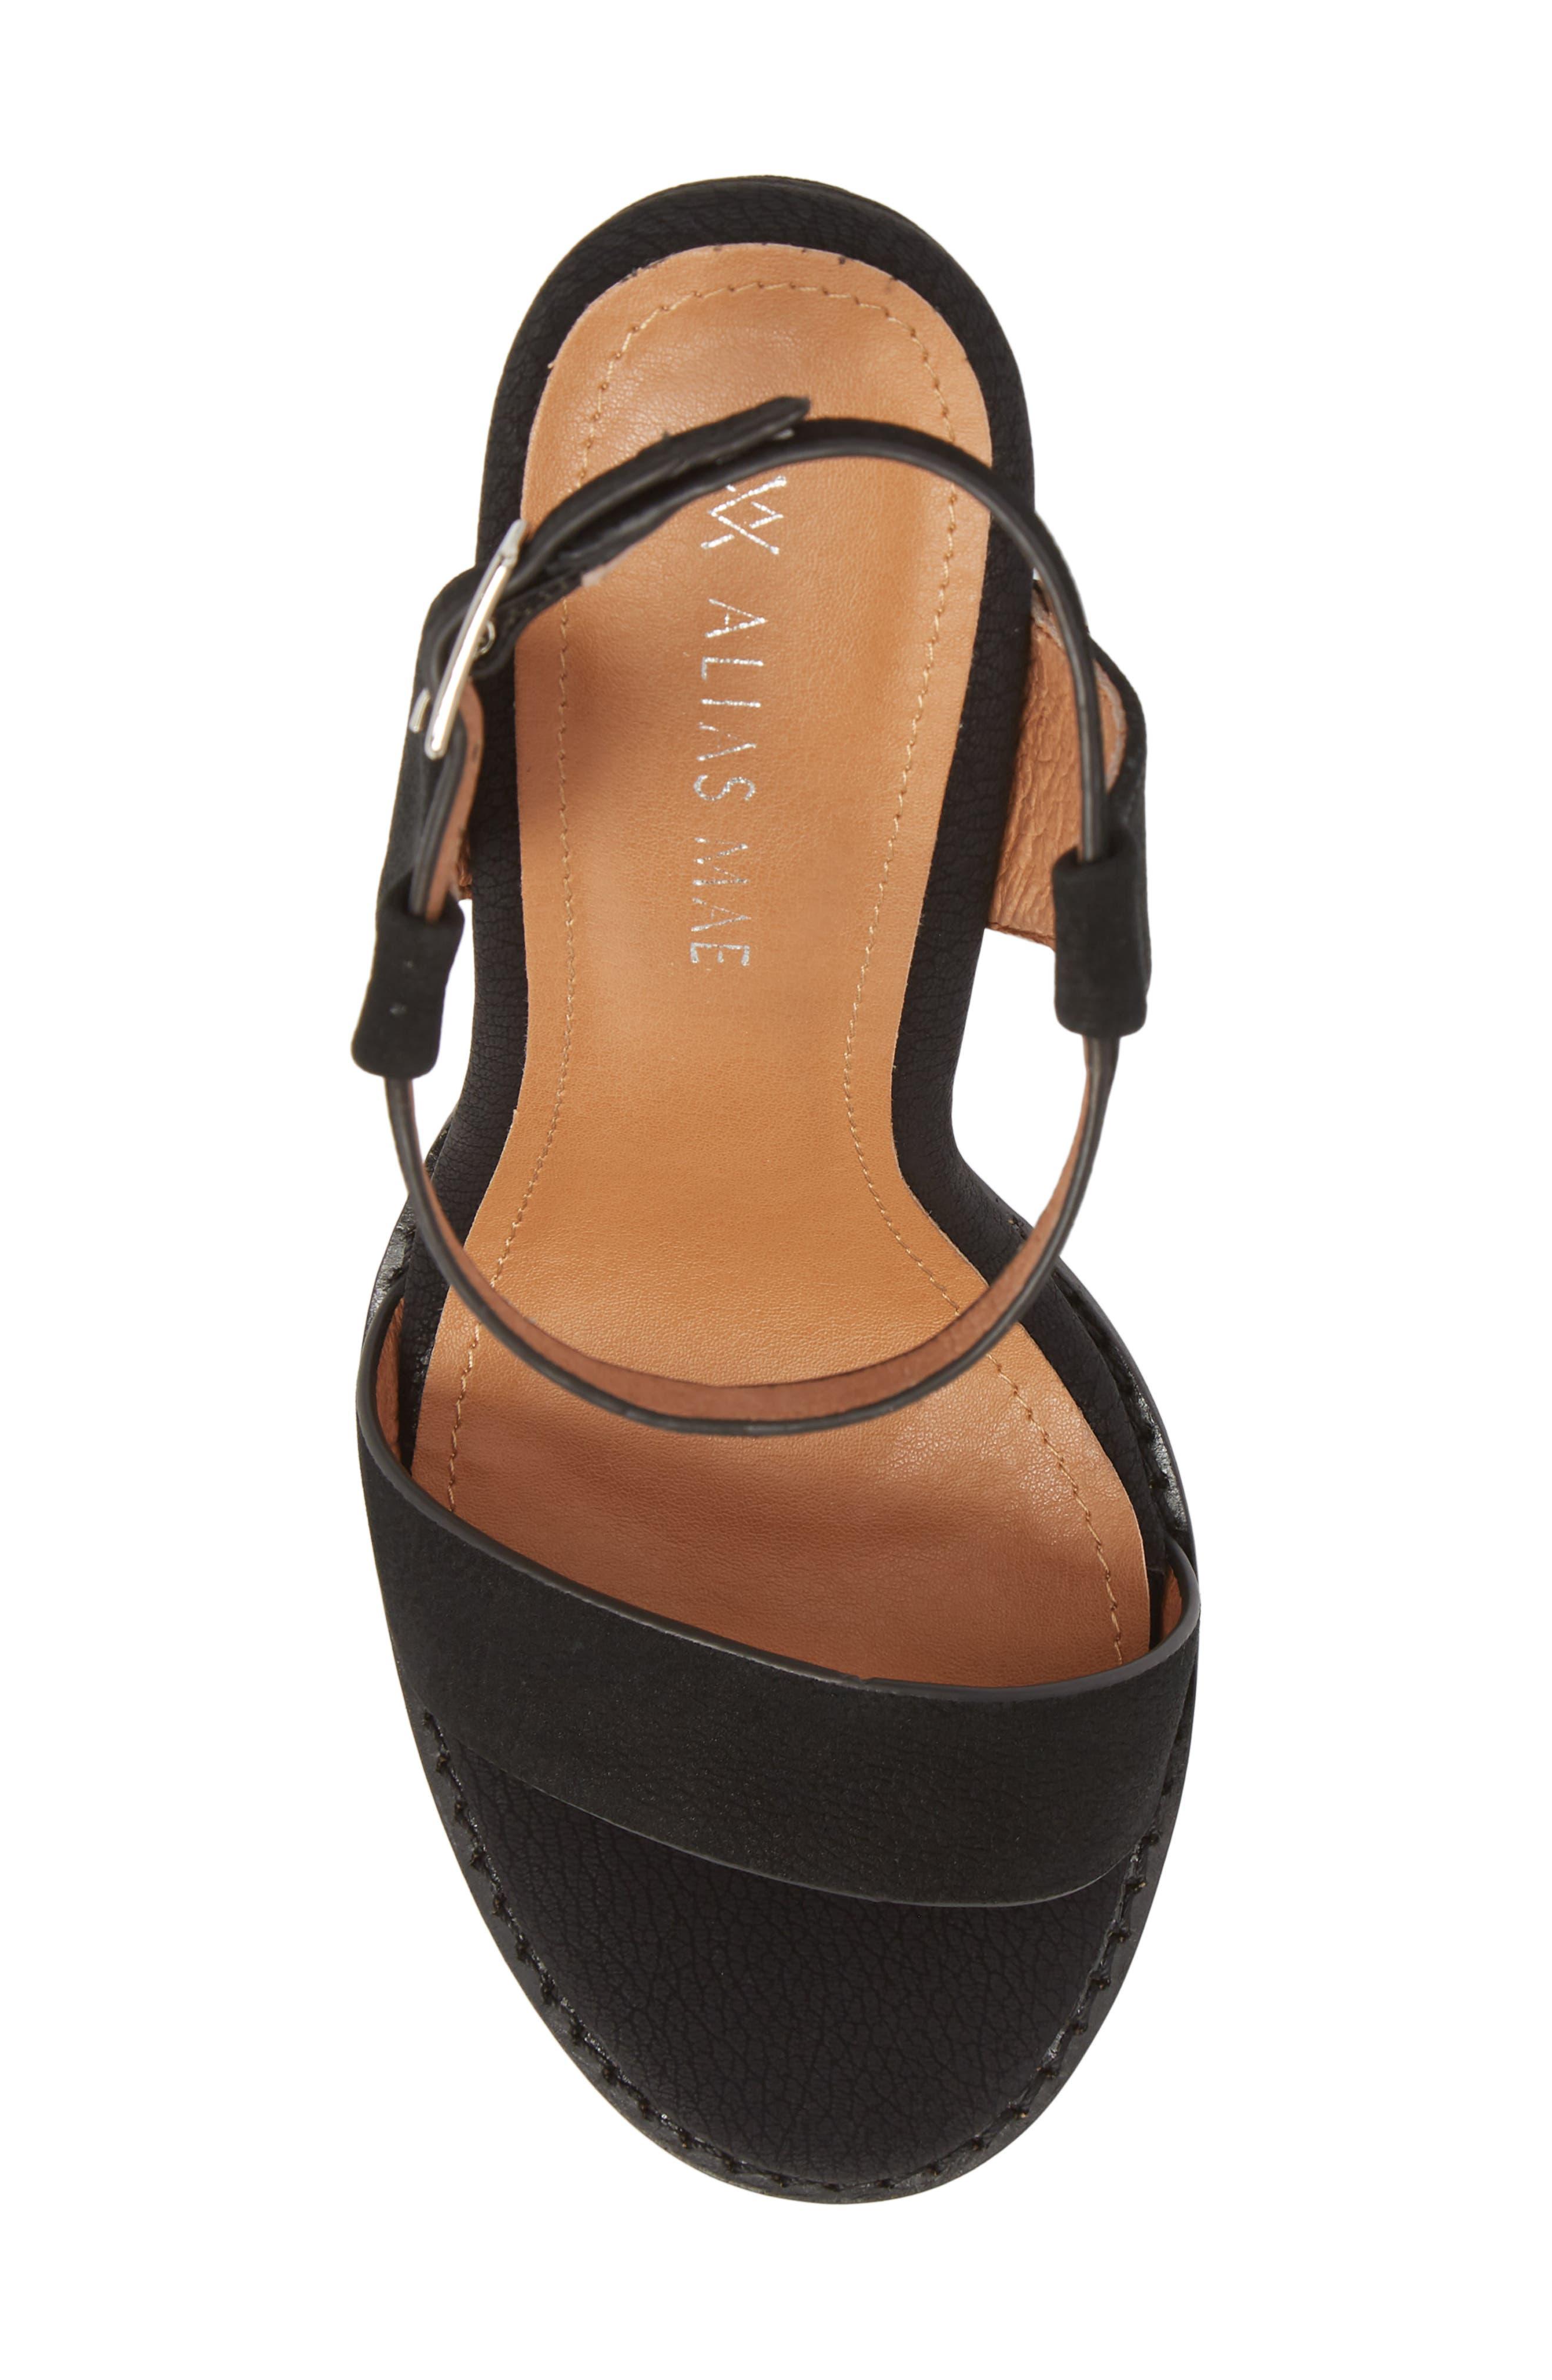 Jynk Sandal,                             Alternate thumbnail 5, color,                             Black Leather